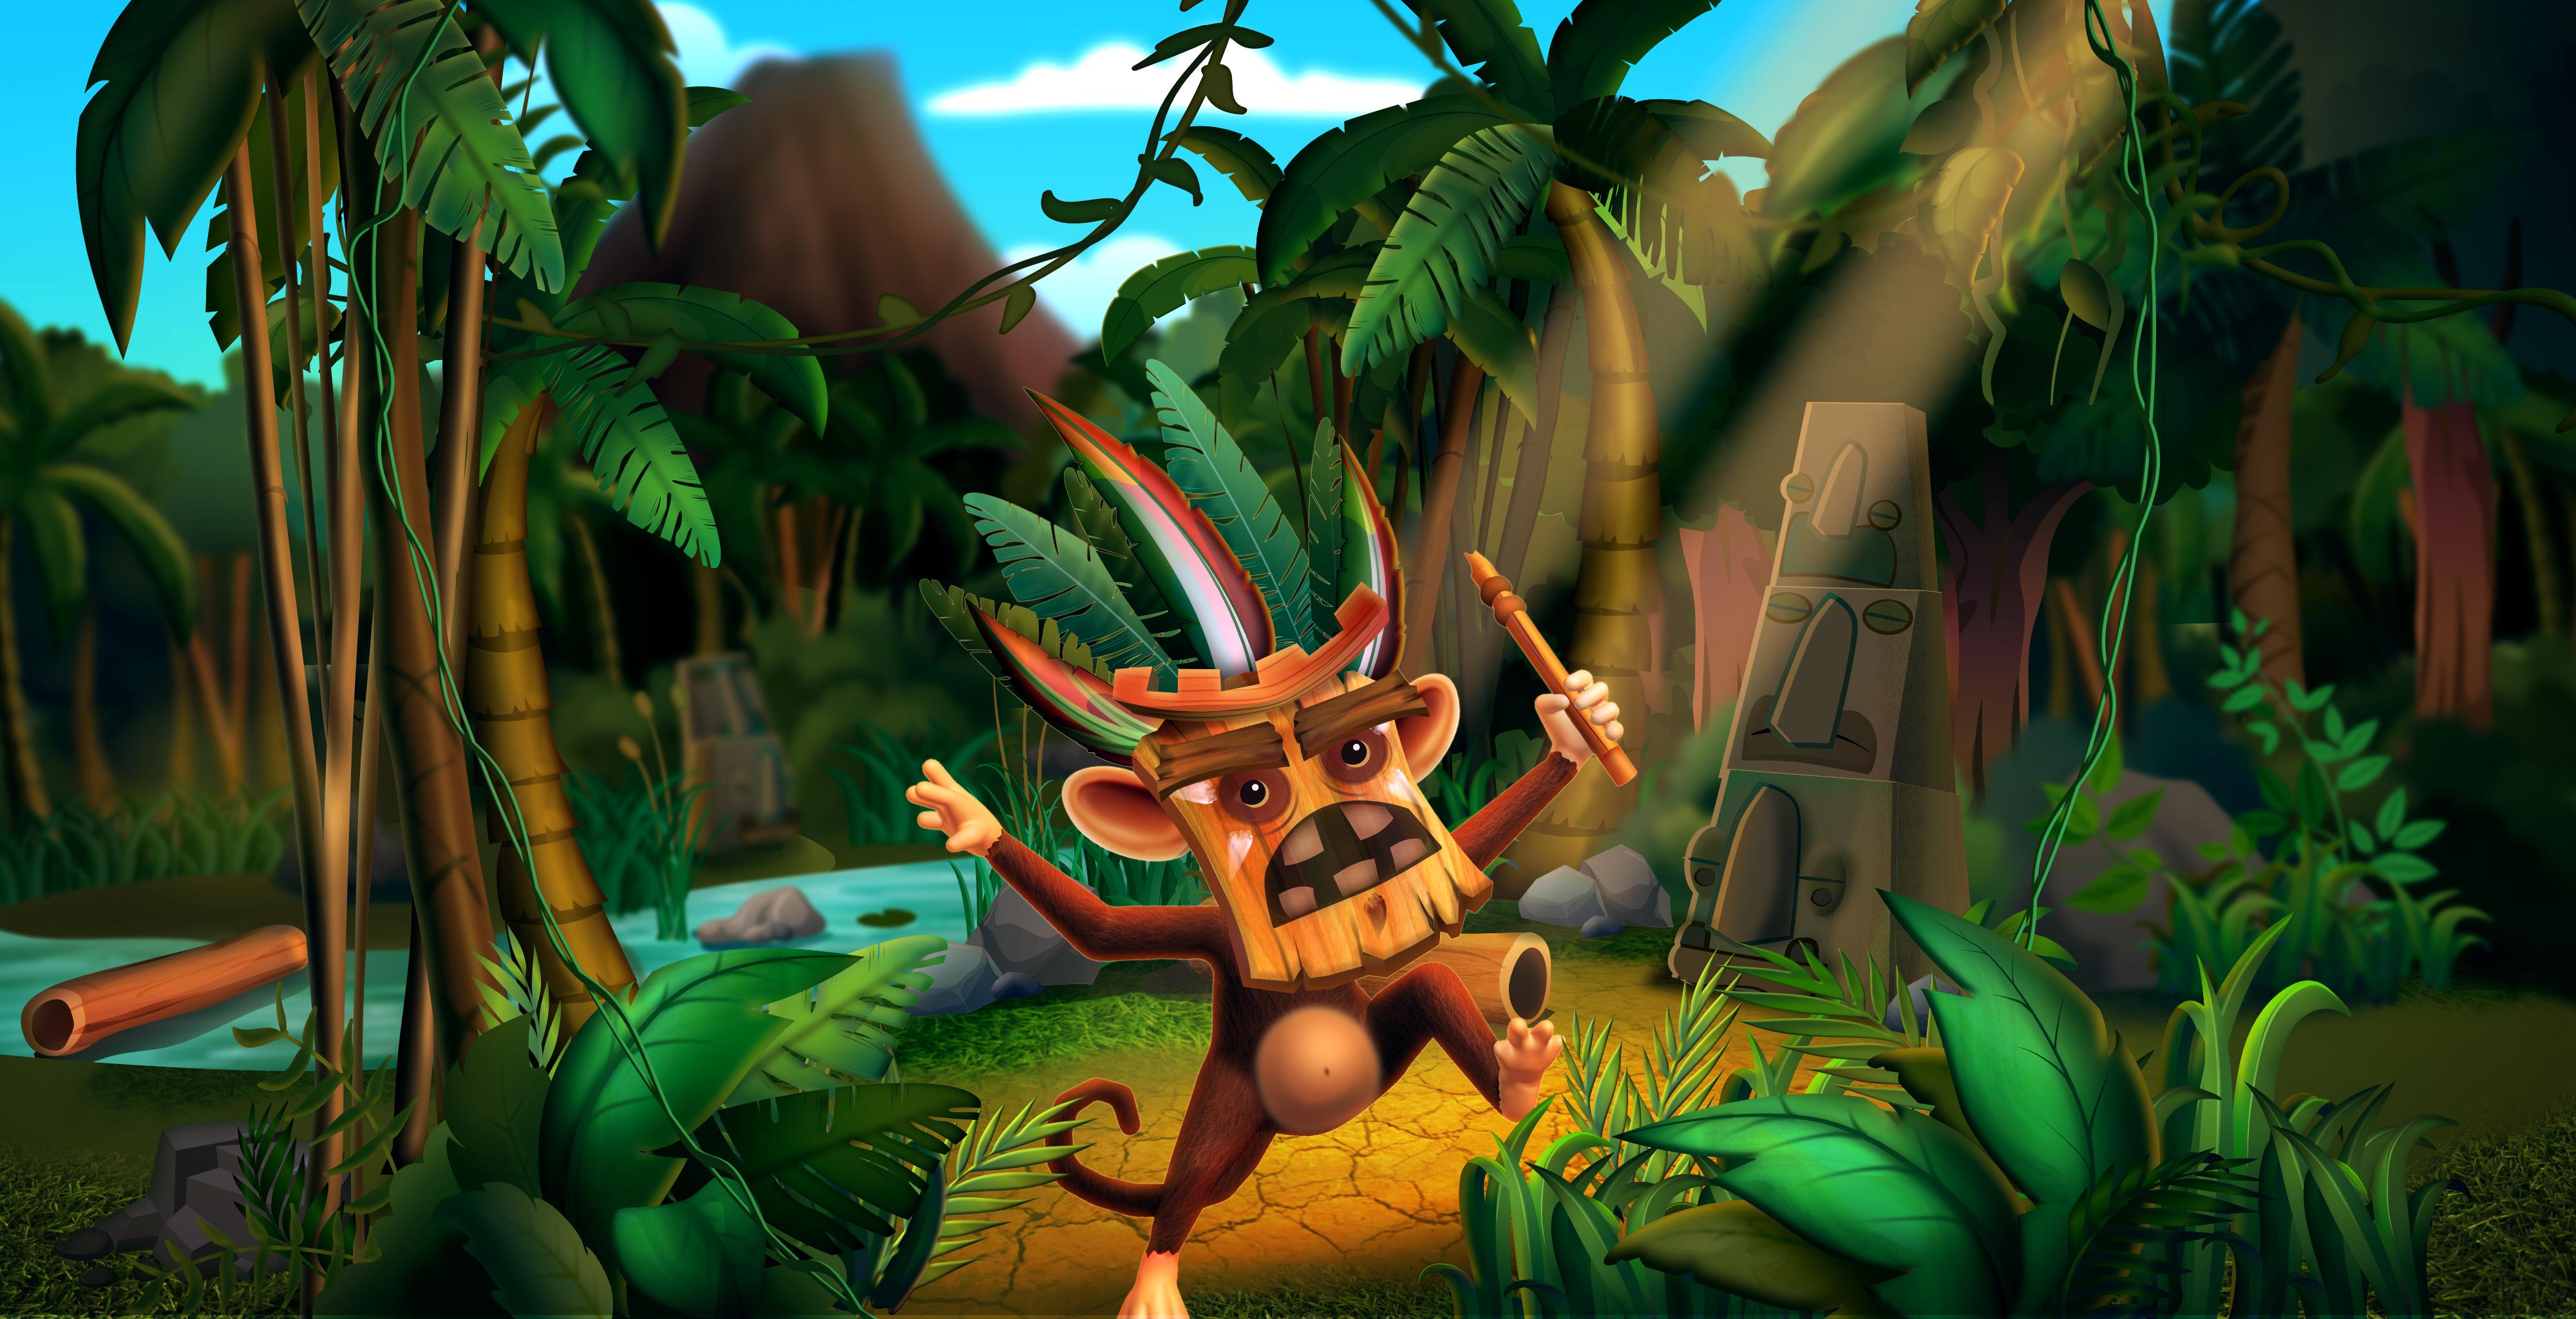 Game Art Wallpaper - Jungle